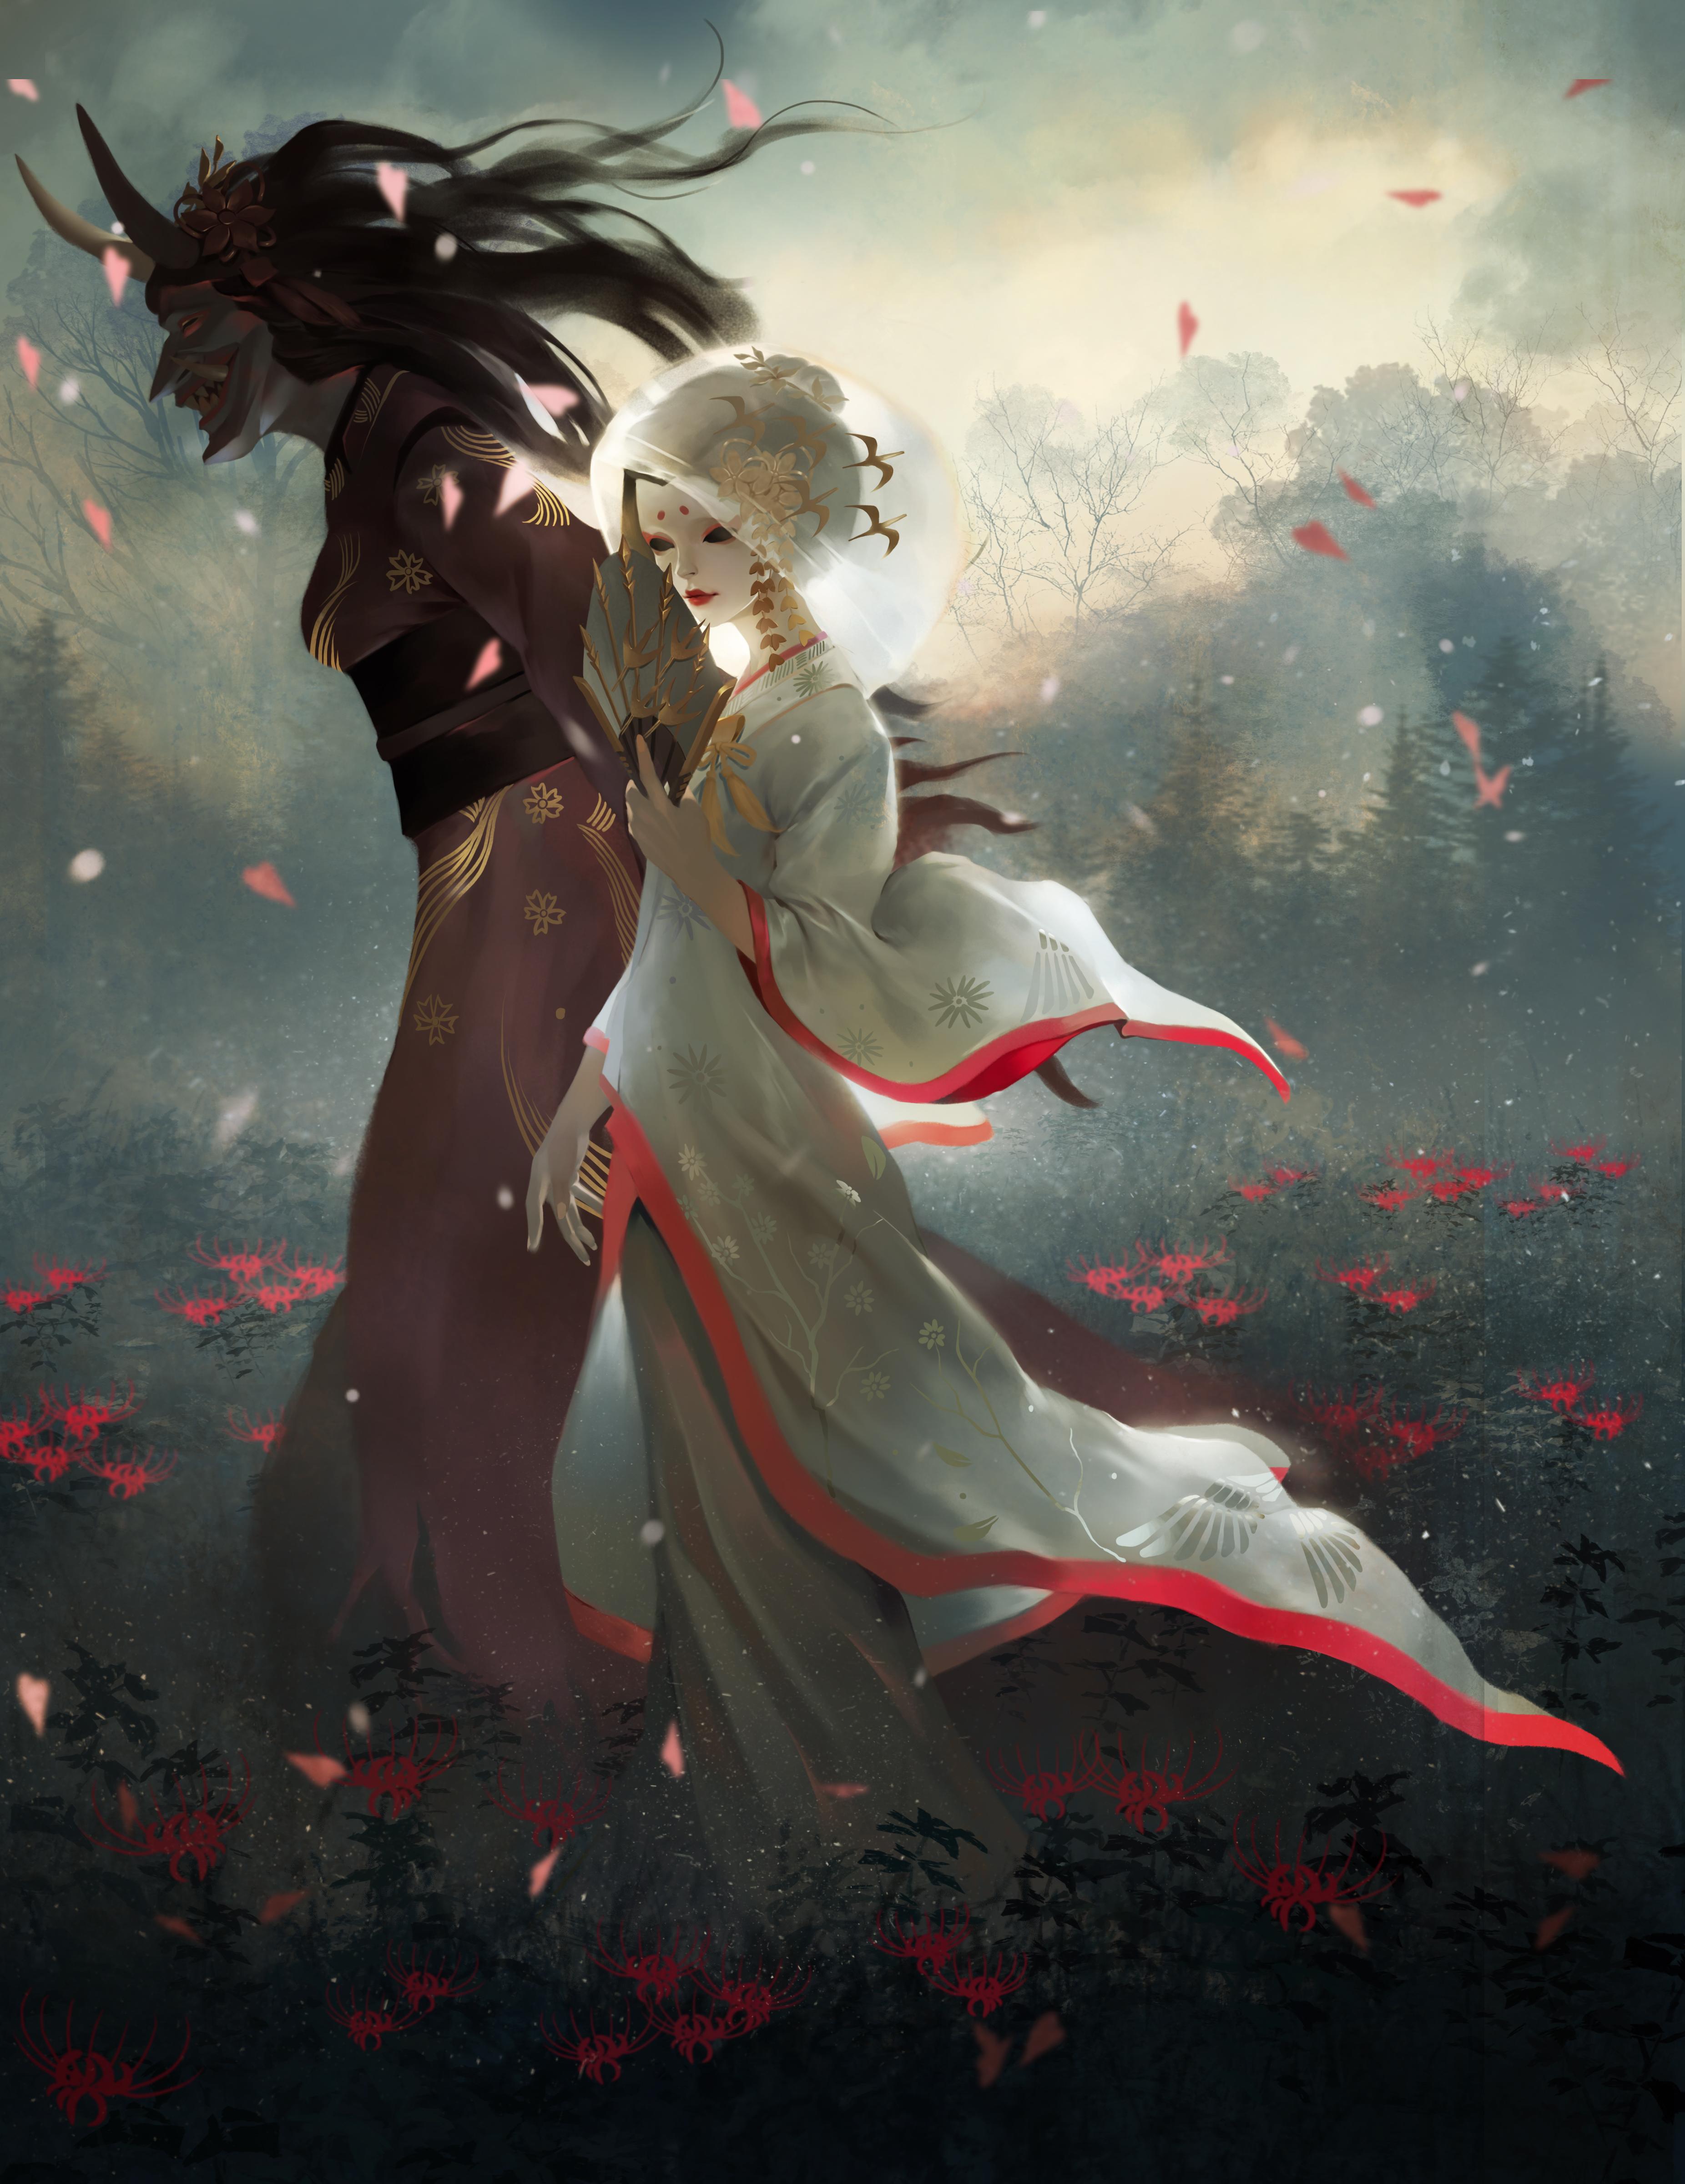 Digital Art Illustration Midfinger Geisha Oni Horns Original Characters Vertical 3704x4800